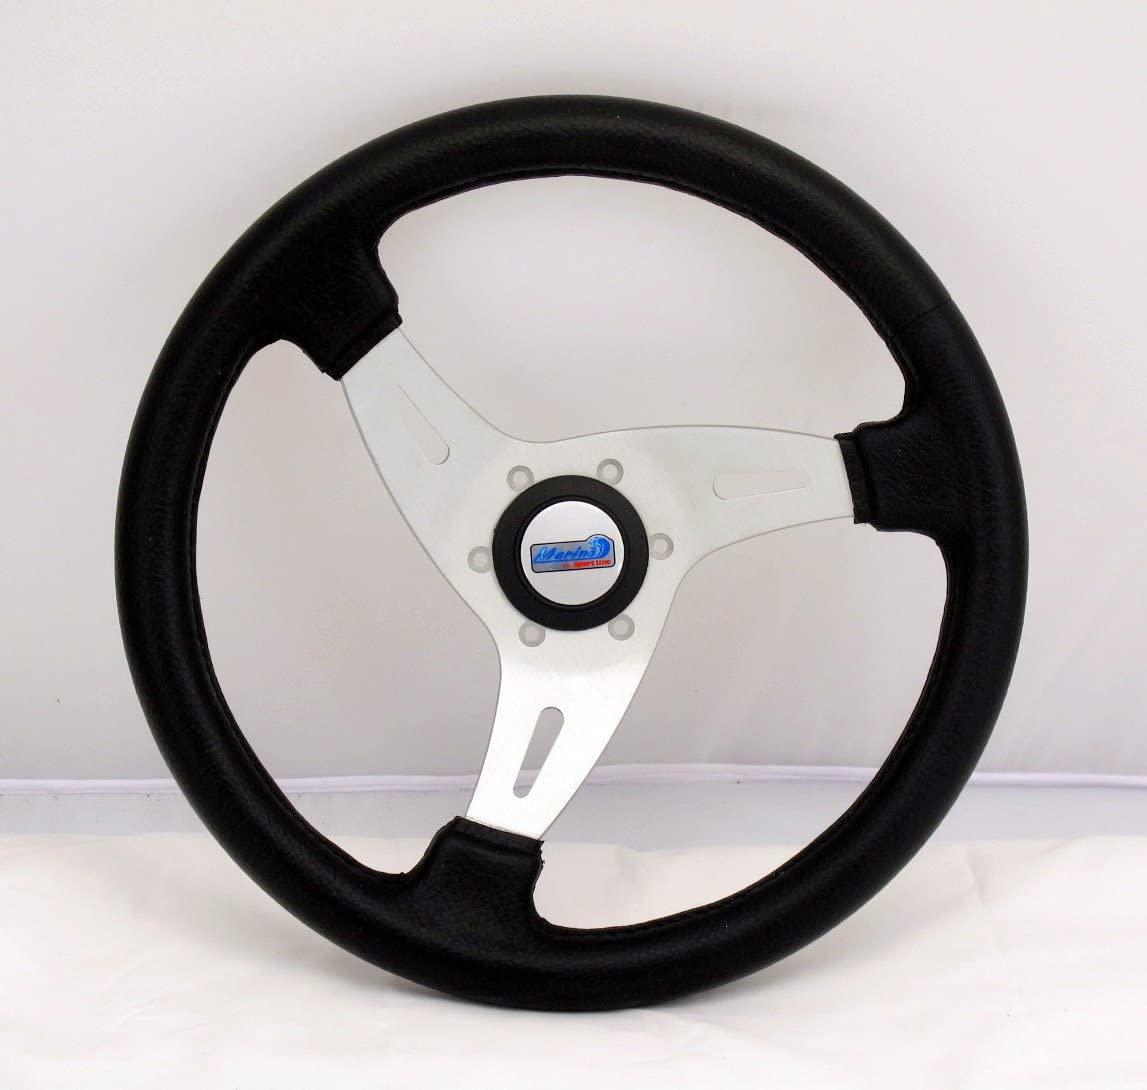 Sport Line Marine Steering Wheel - Vortice - 350mm (13.78 inches) - Black Polyurethane with Silver Spokes - Part # 50200/N (WOH)